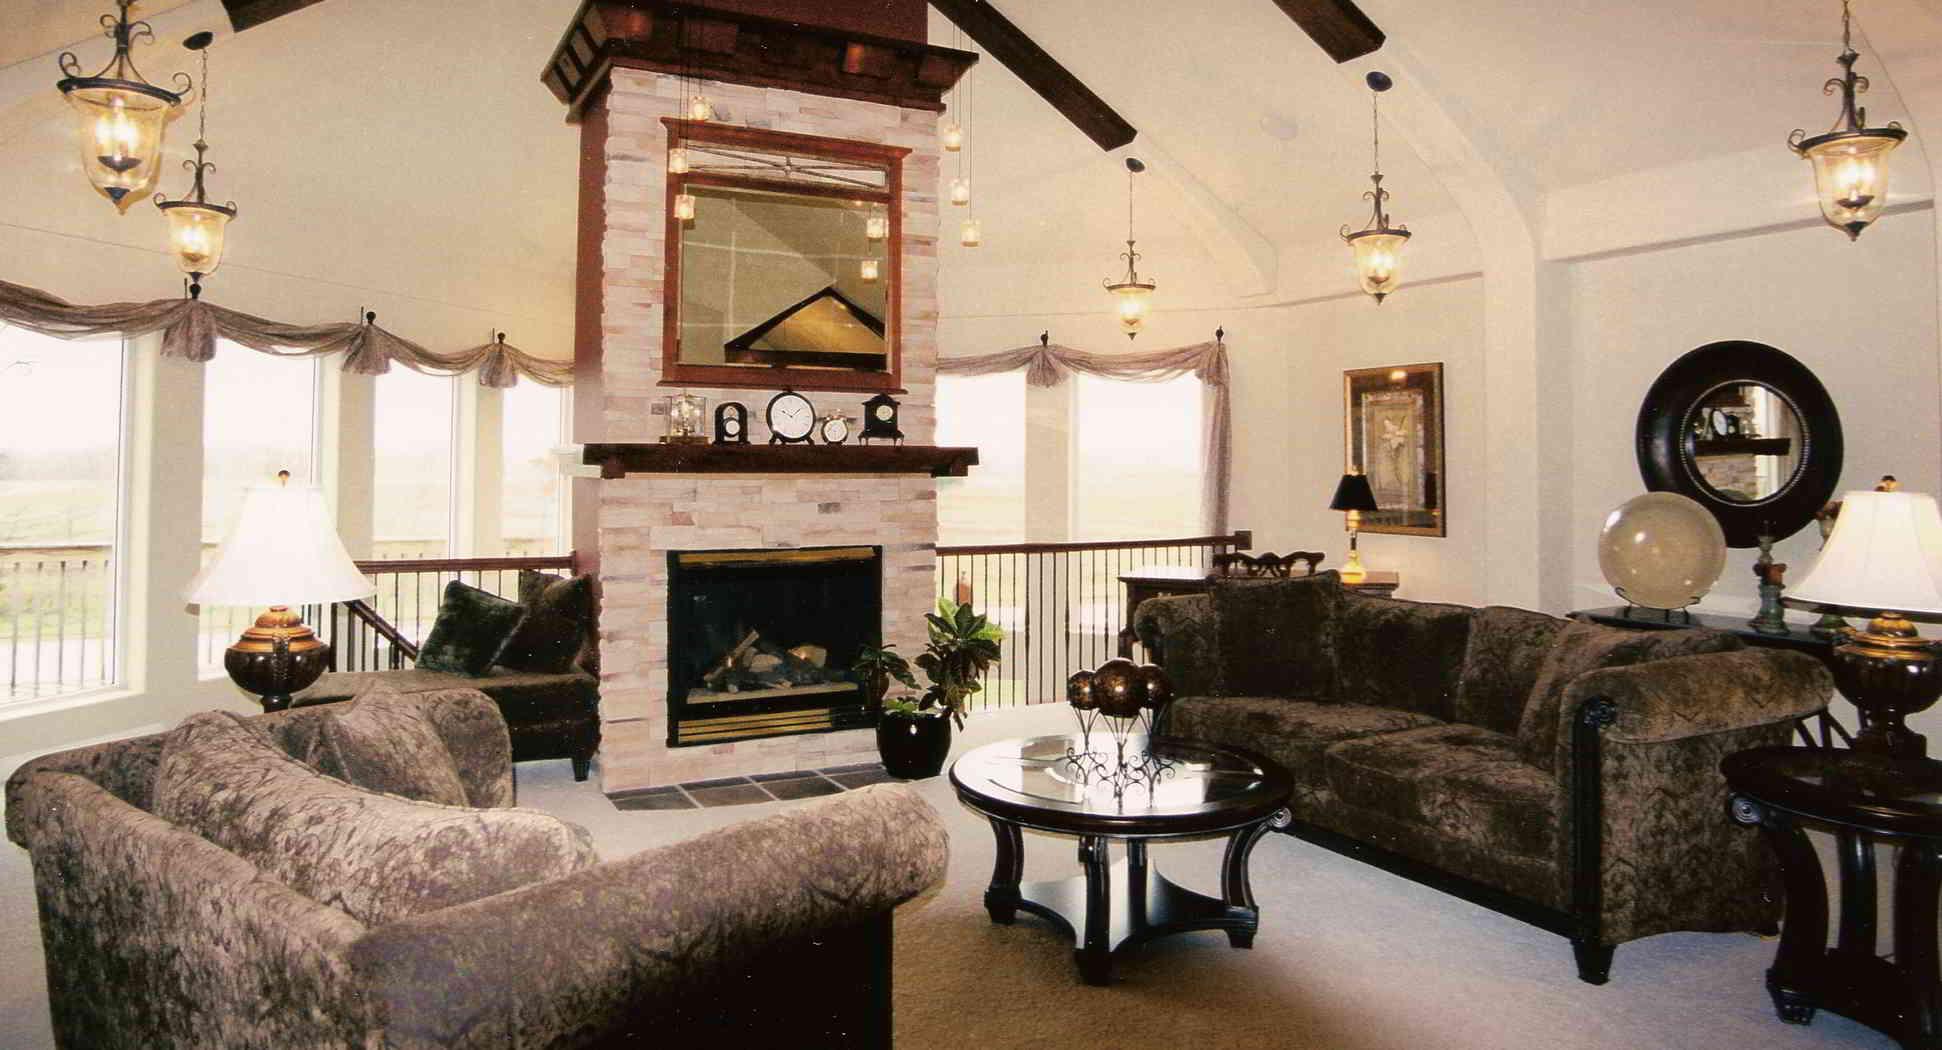 Inc Homes Designworks is close to Keith Hamilton Builder Contr